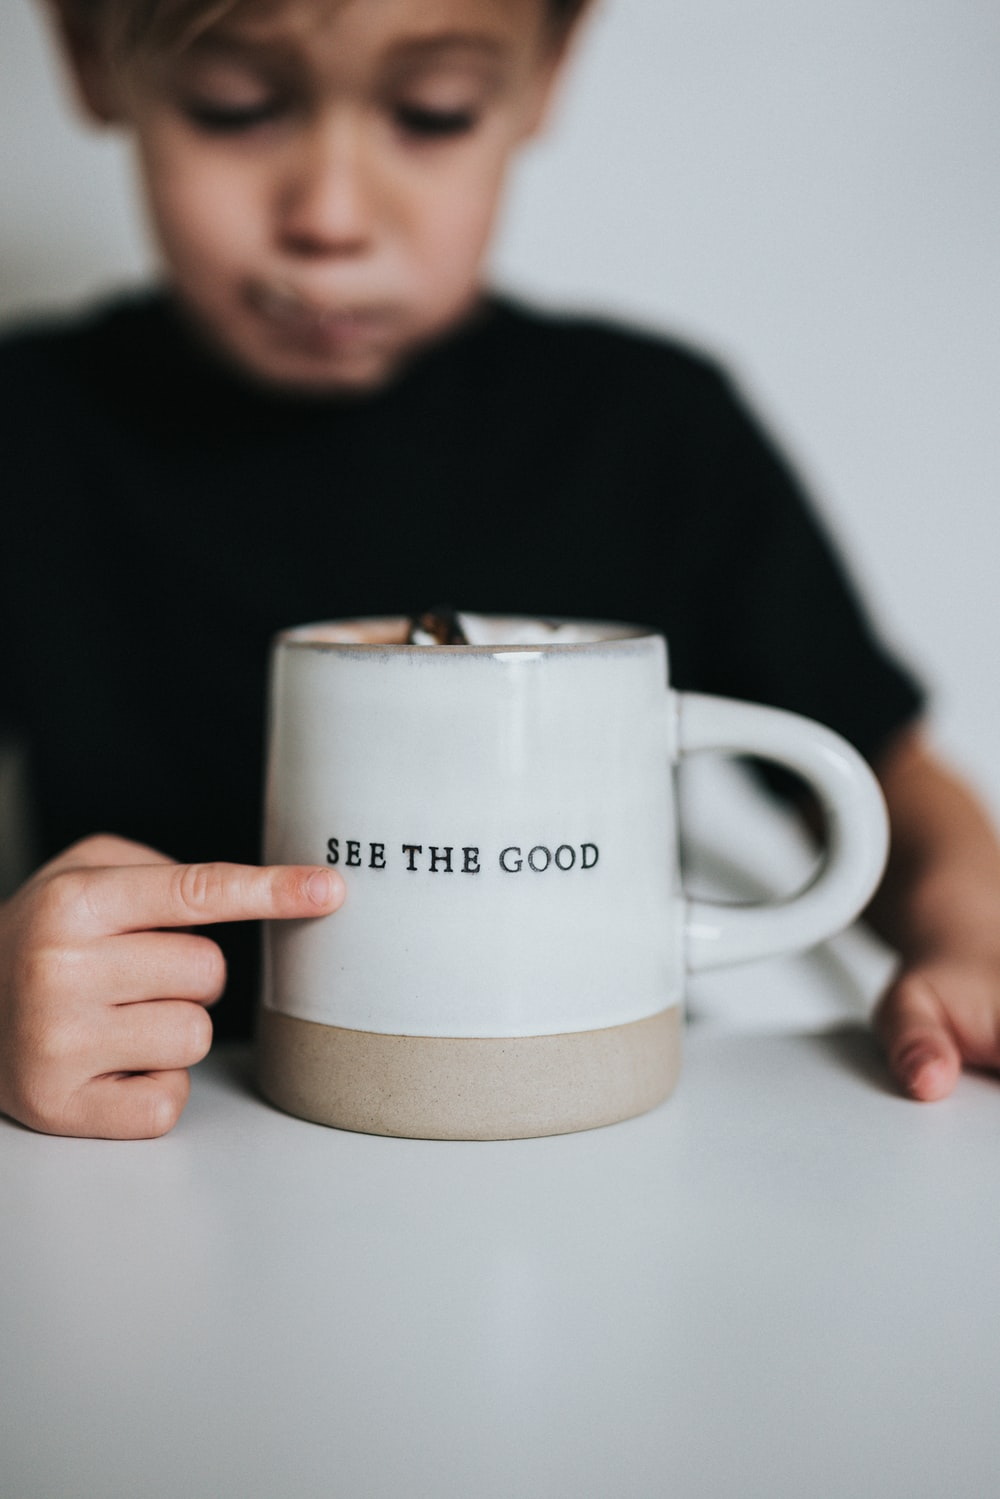 man in black long sleeve shirt holding white ceramic mug